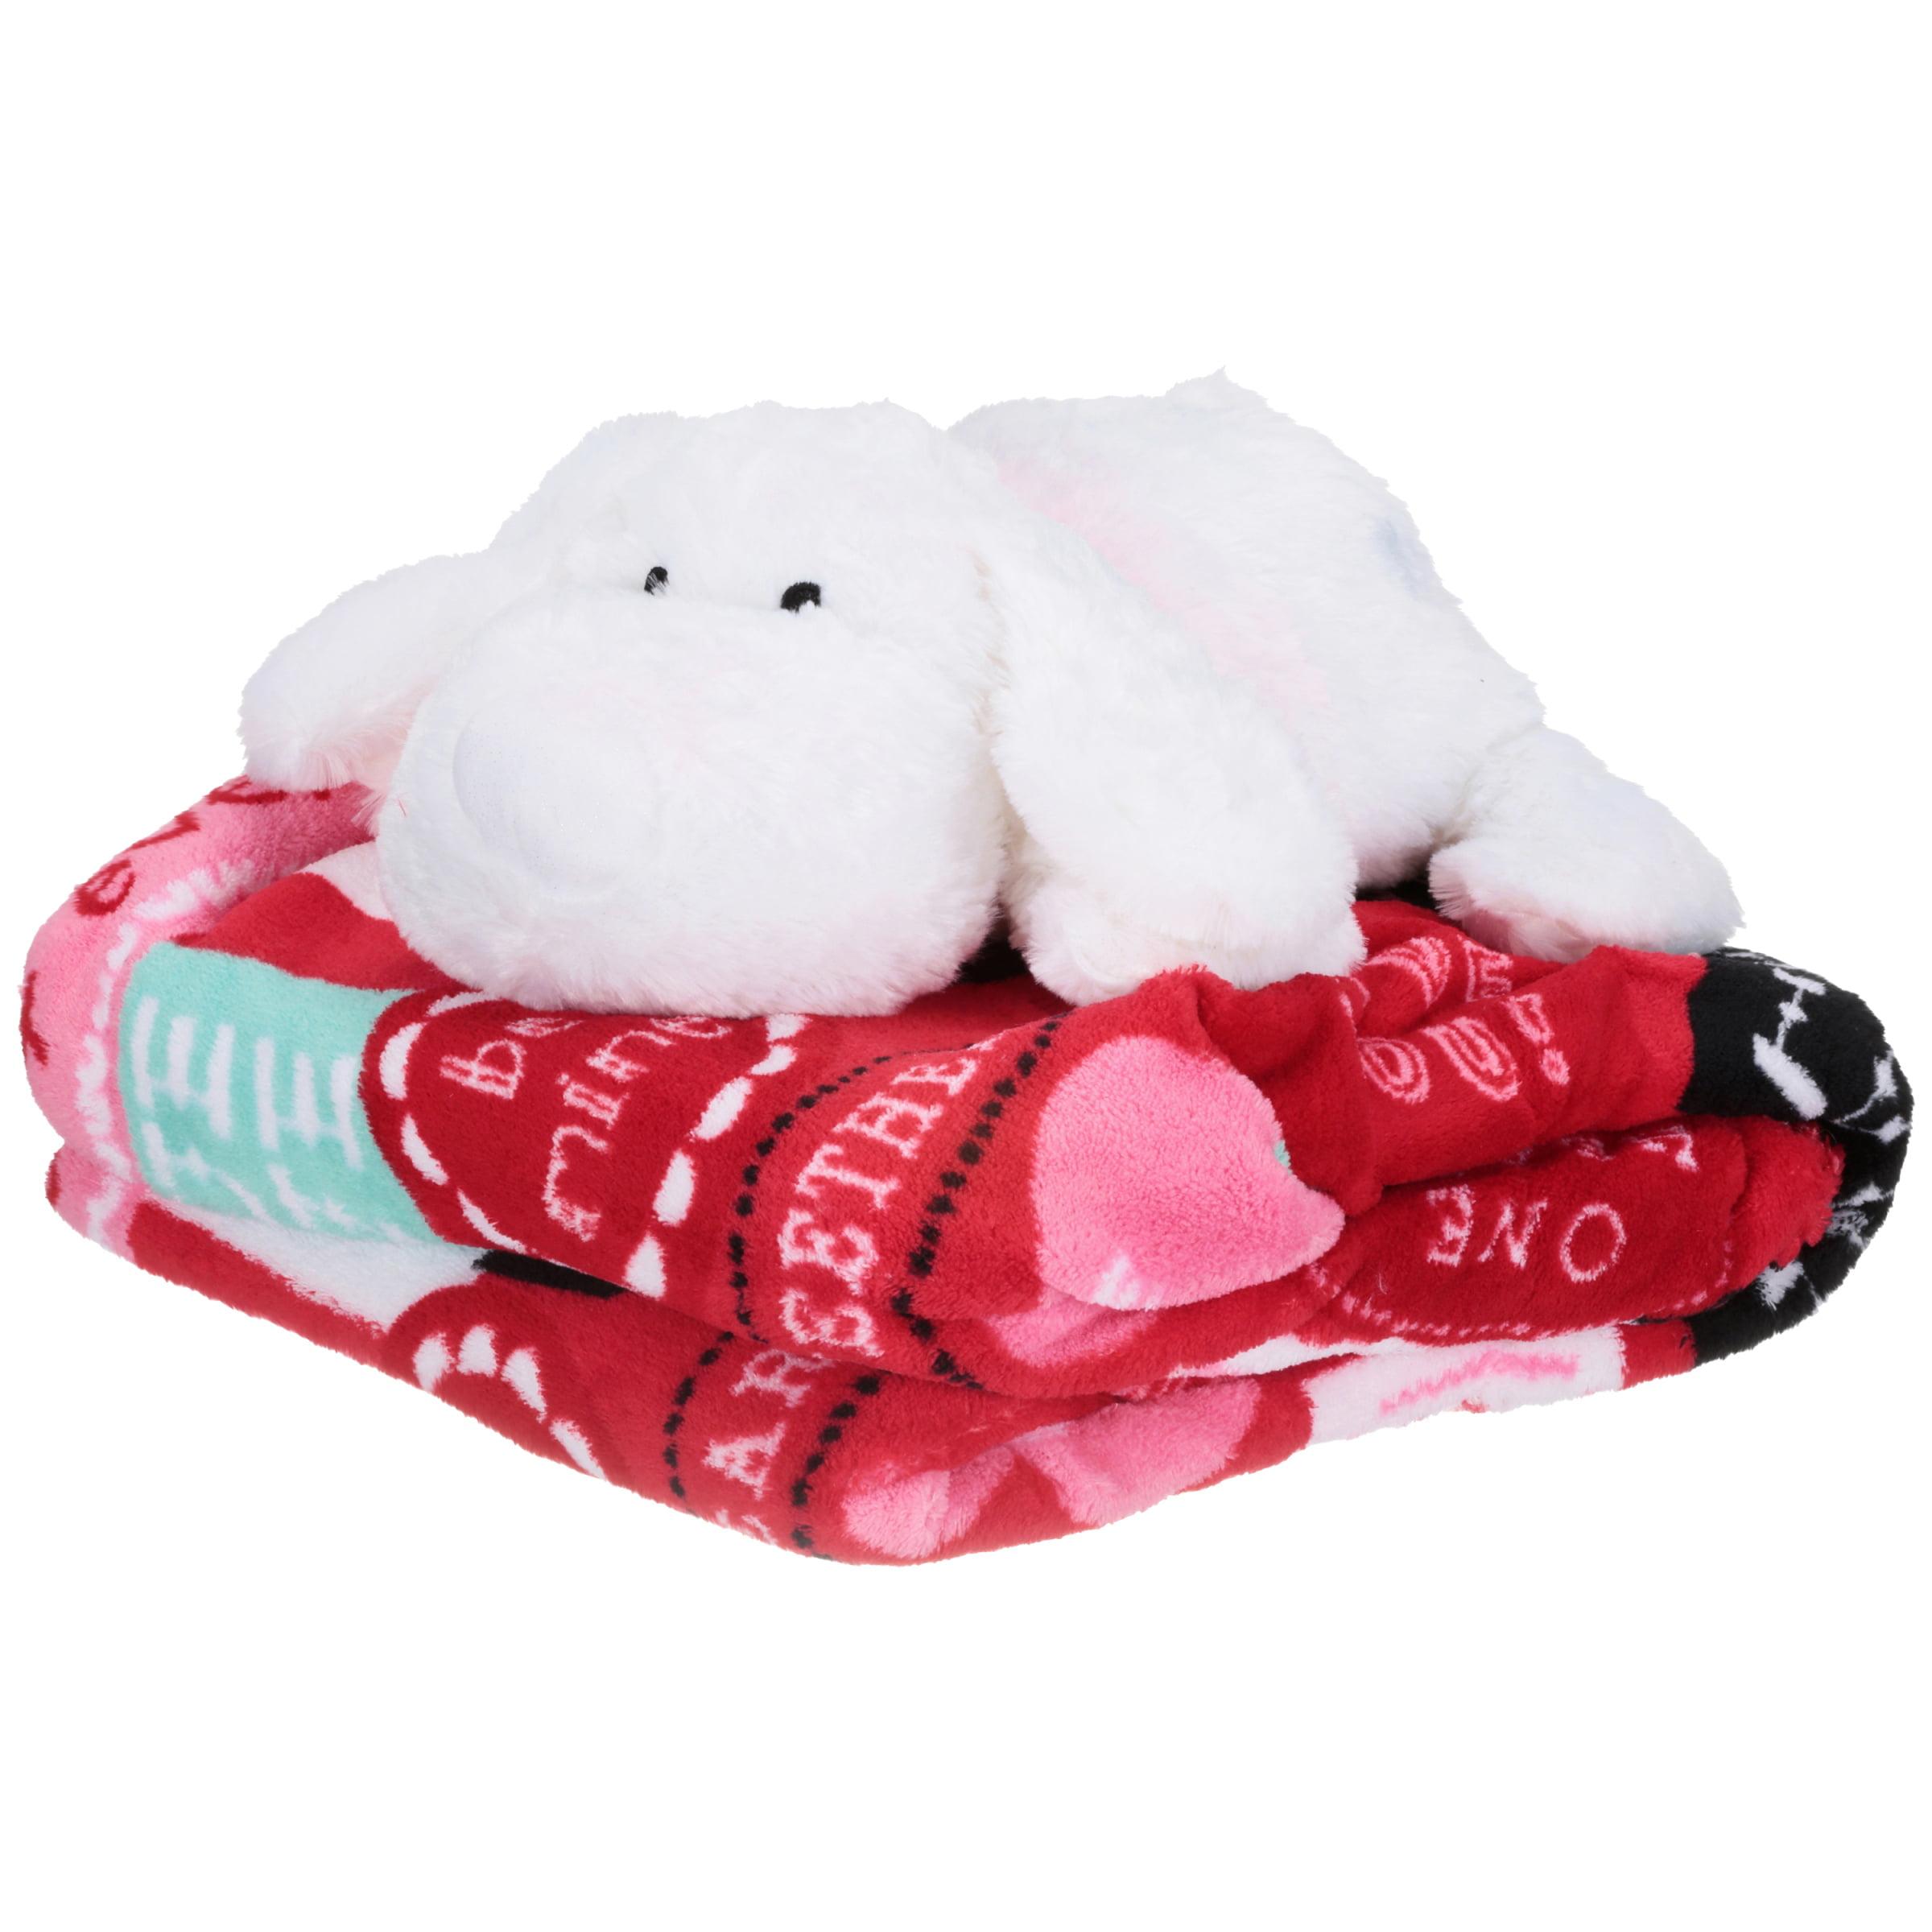 Valentine's Day Sentiments Throw & White Plush Puppy Set 2 pc Pack